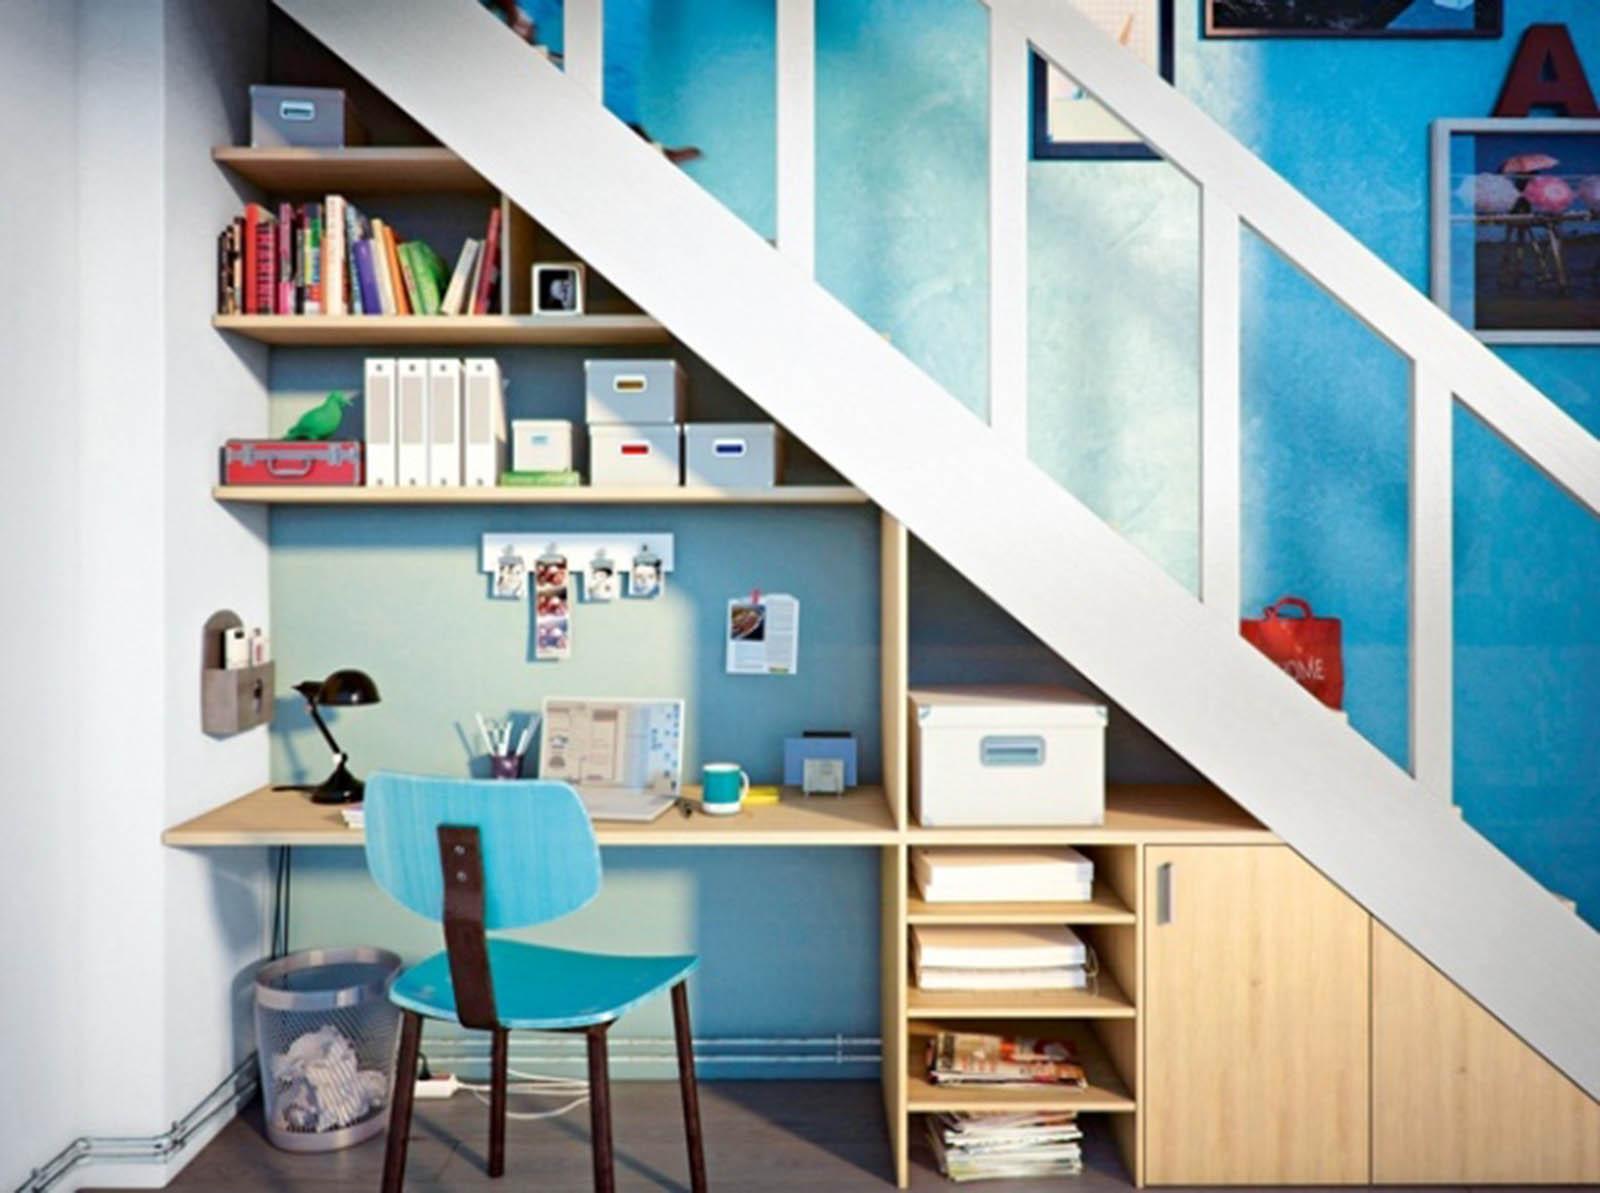 sous escalier ikea placard sous escalier castorama gazetka u portes placard sous escalier. Black Bedroom Furniture Sets. Home Design Ideas